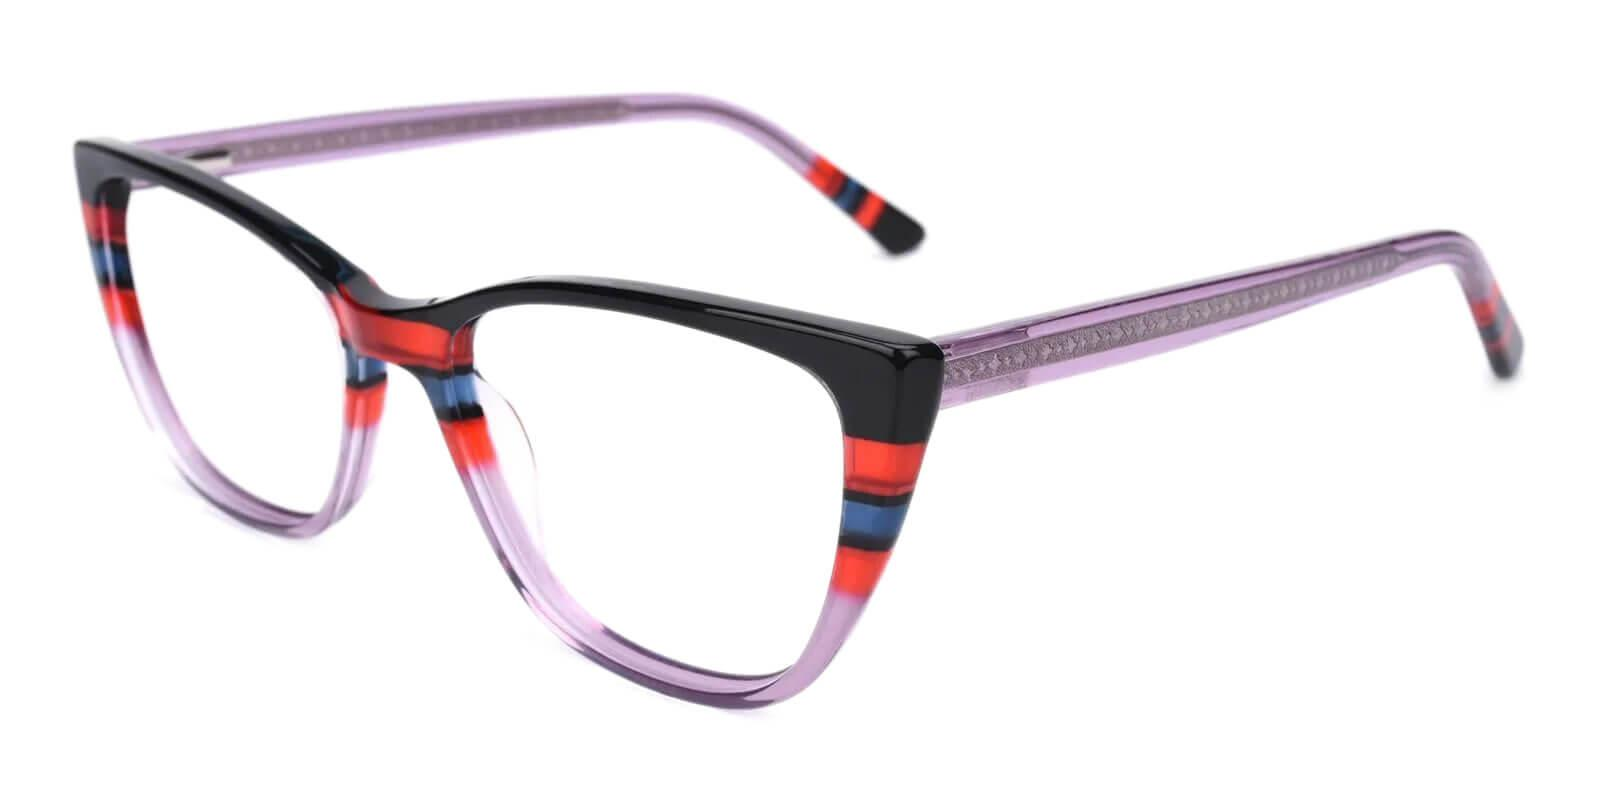 Prague Purple Acetate Eyeglasses , UniversalBridgeFit Frames from ABBE Glasses